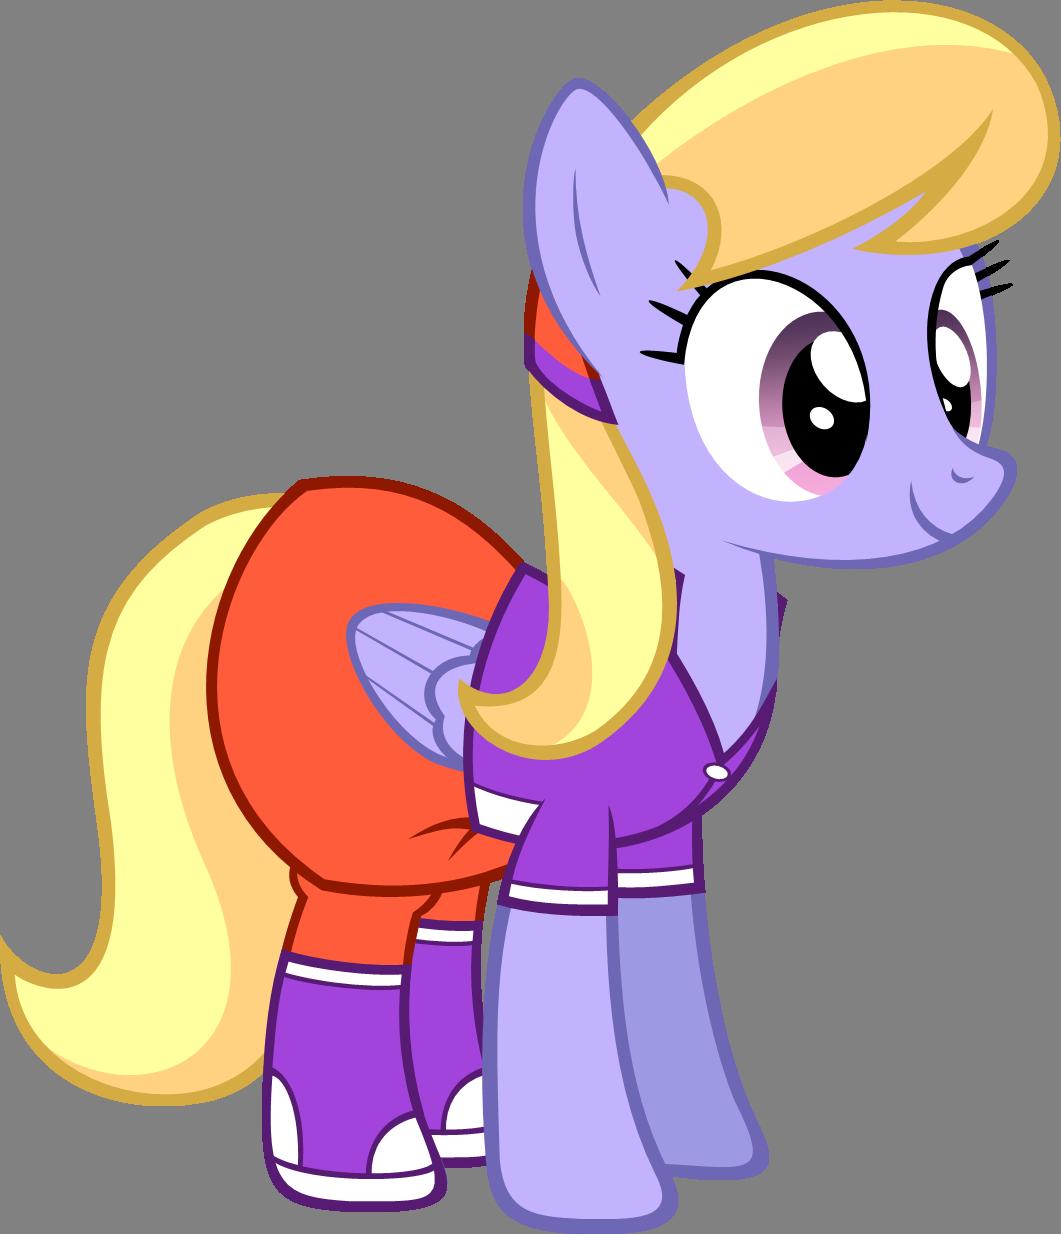 Cloudkicker - Equestria Girls Clothing by Zacatron94 on DeviantArt